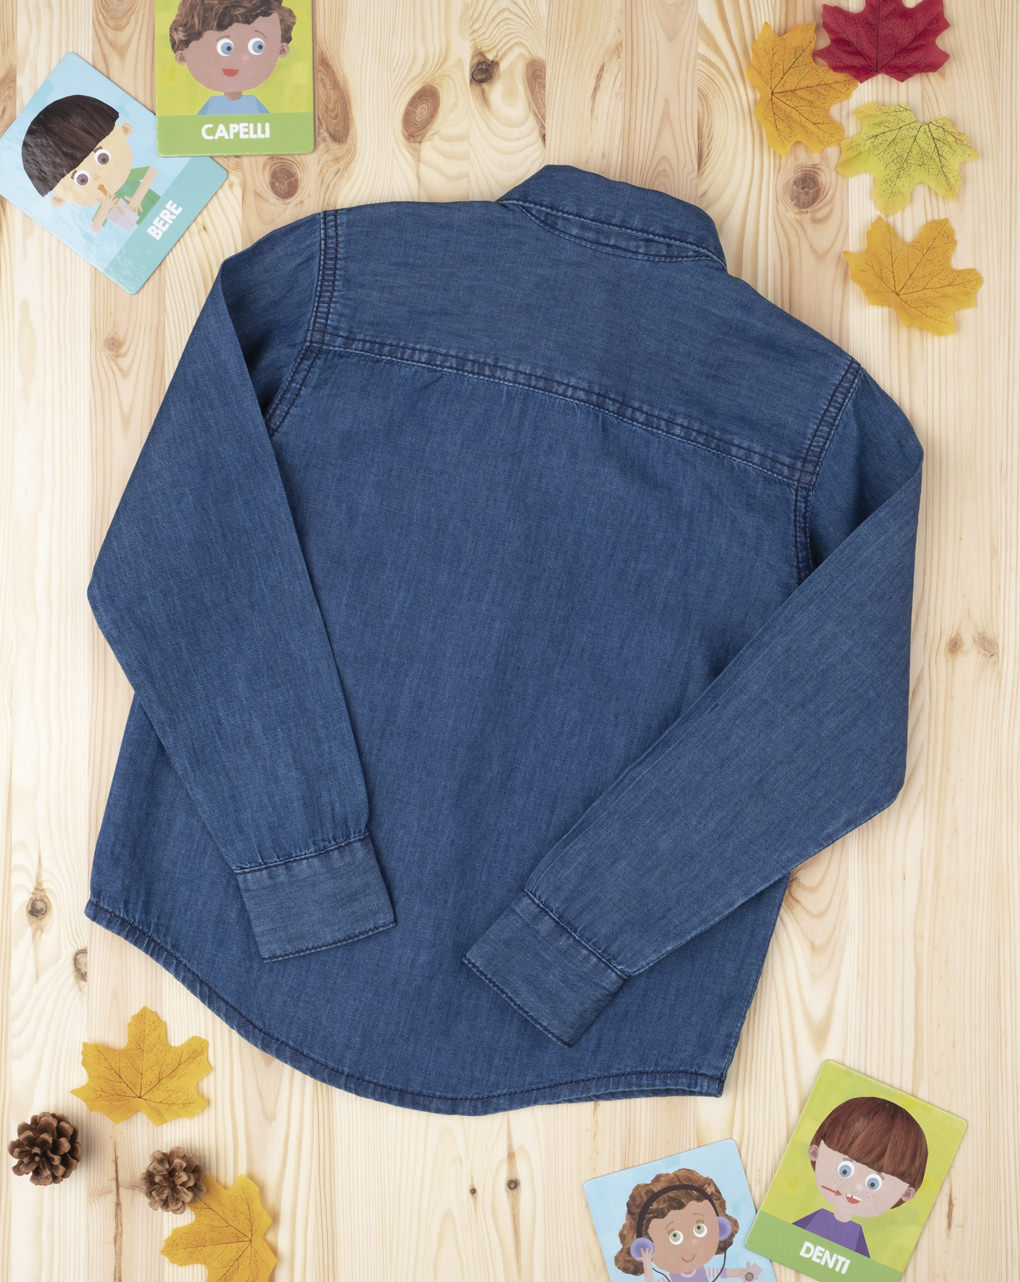 Camisa azul jeans menino - Prénatal